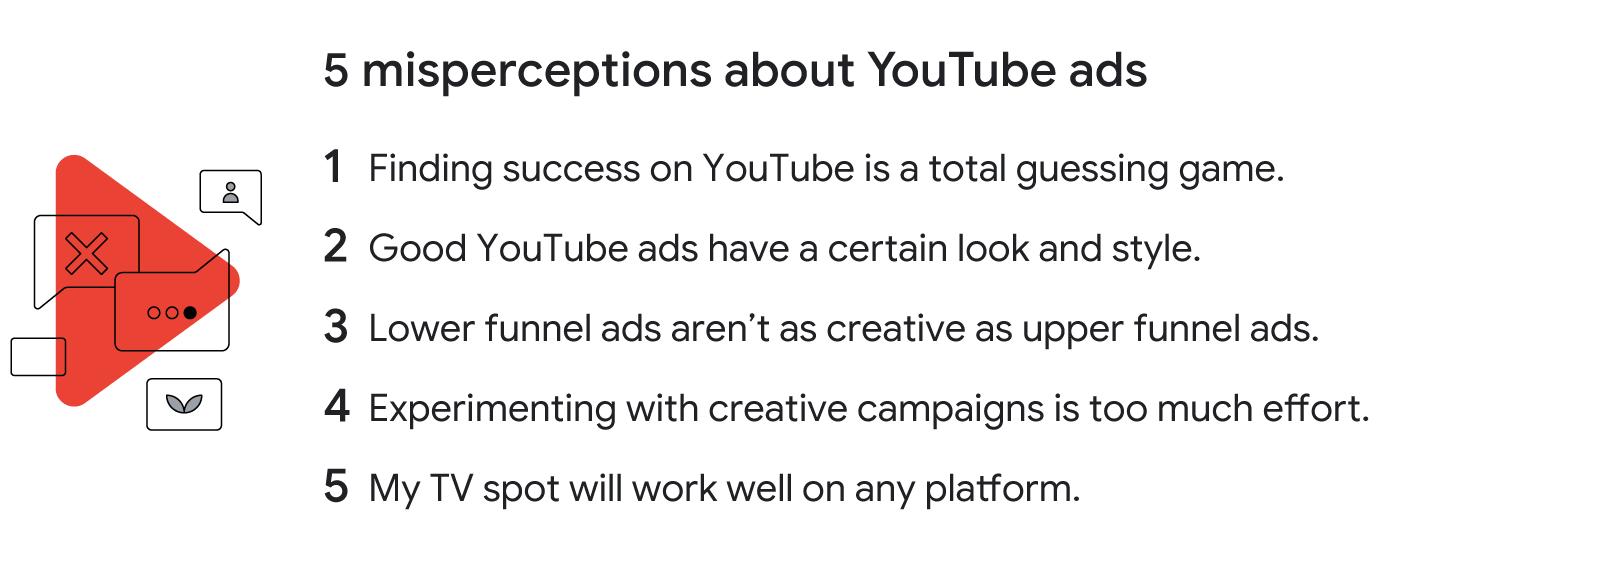 YouTube Ads misperceptions